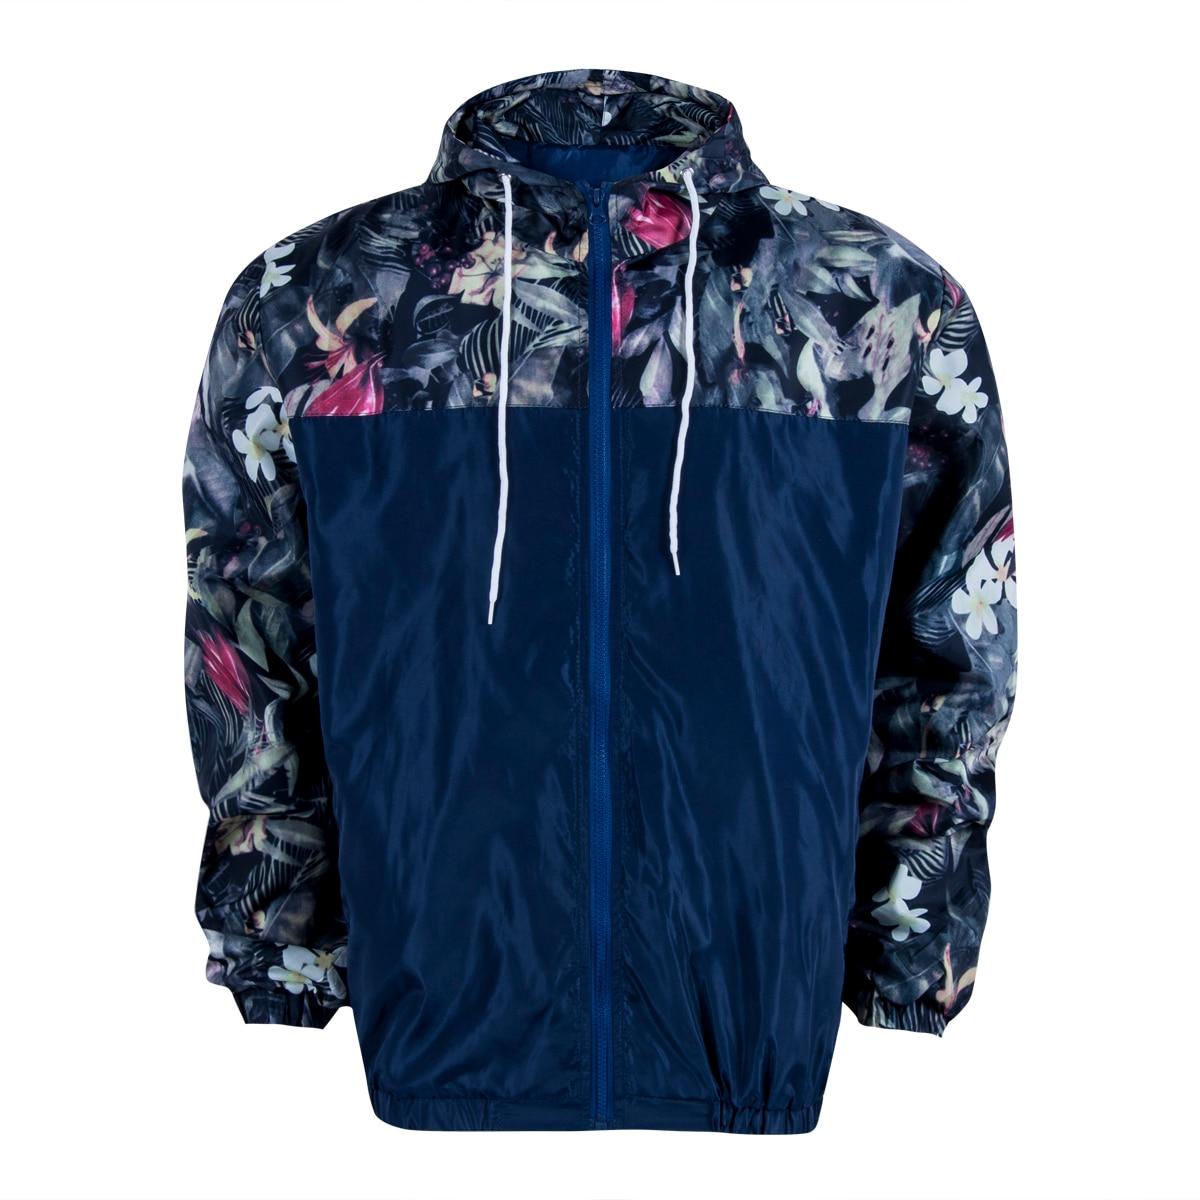 New Men/'s Casual Thin Hooded Jacket Windbreaker Sport Loose Coat Tops